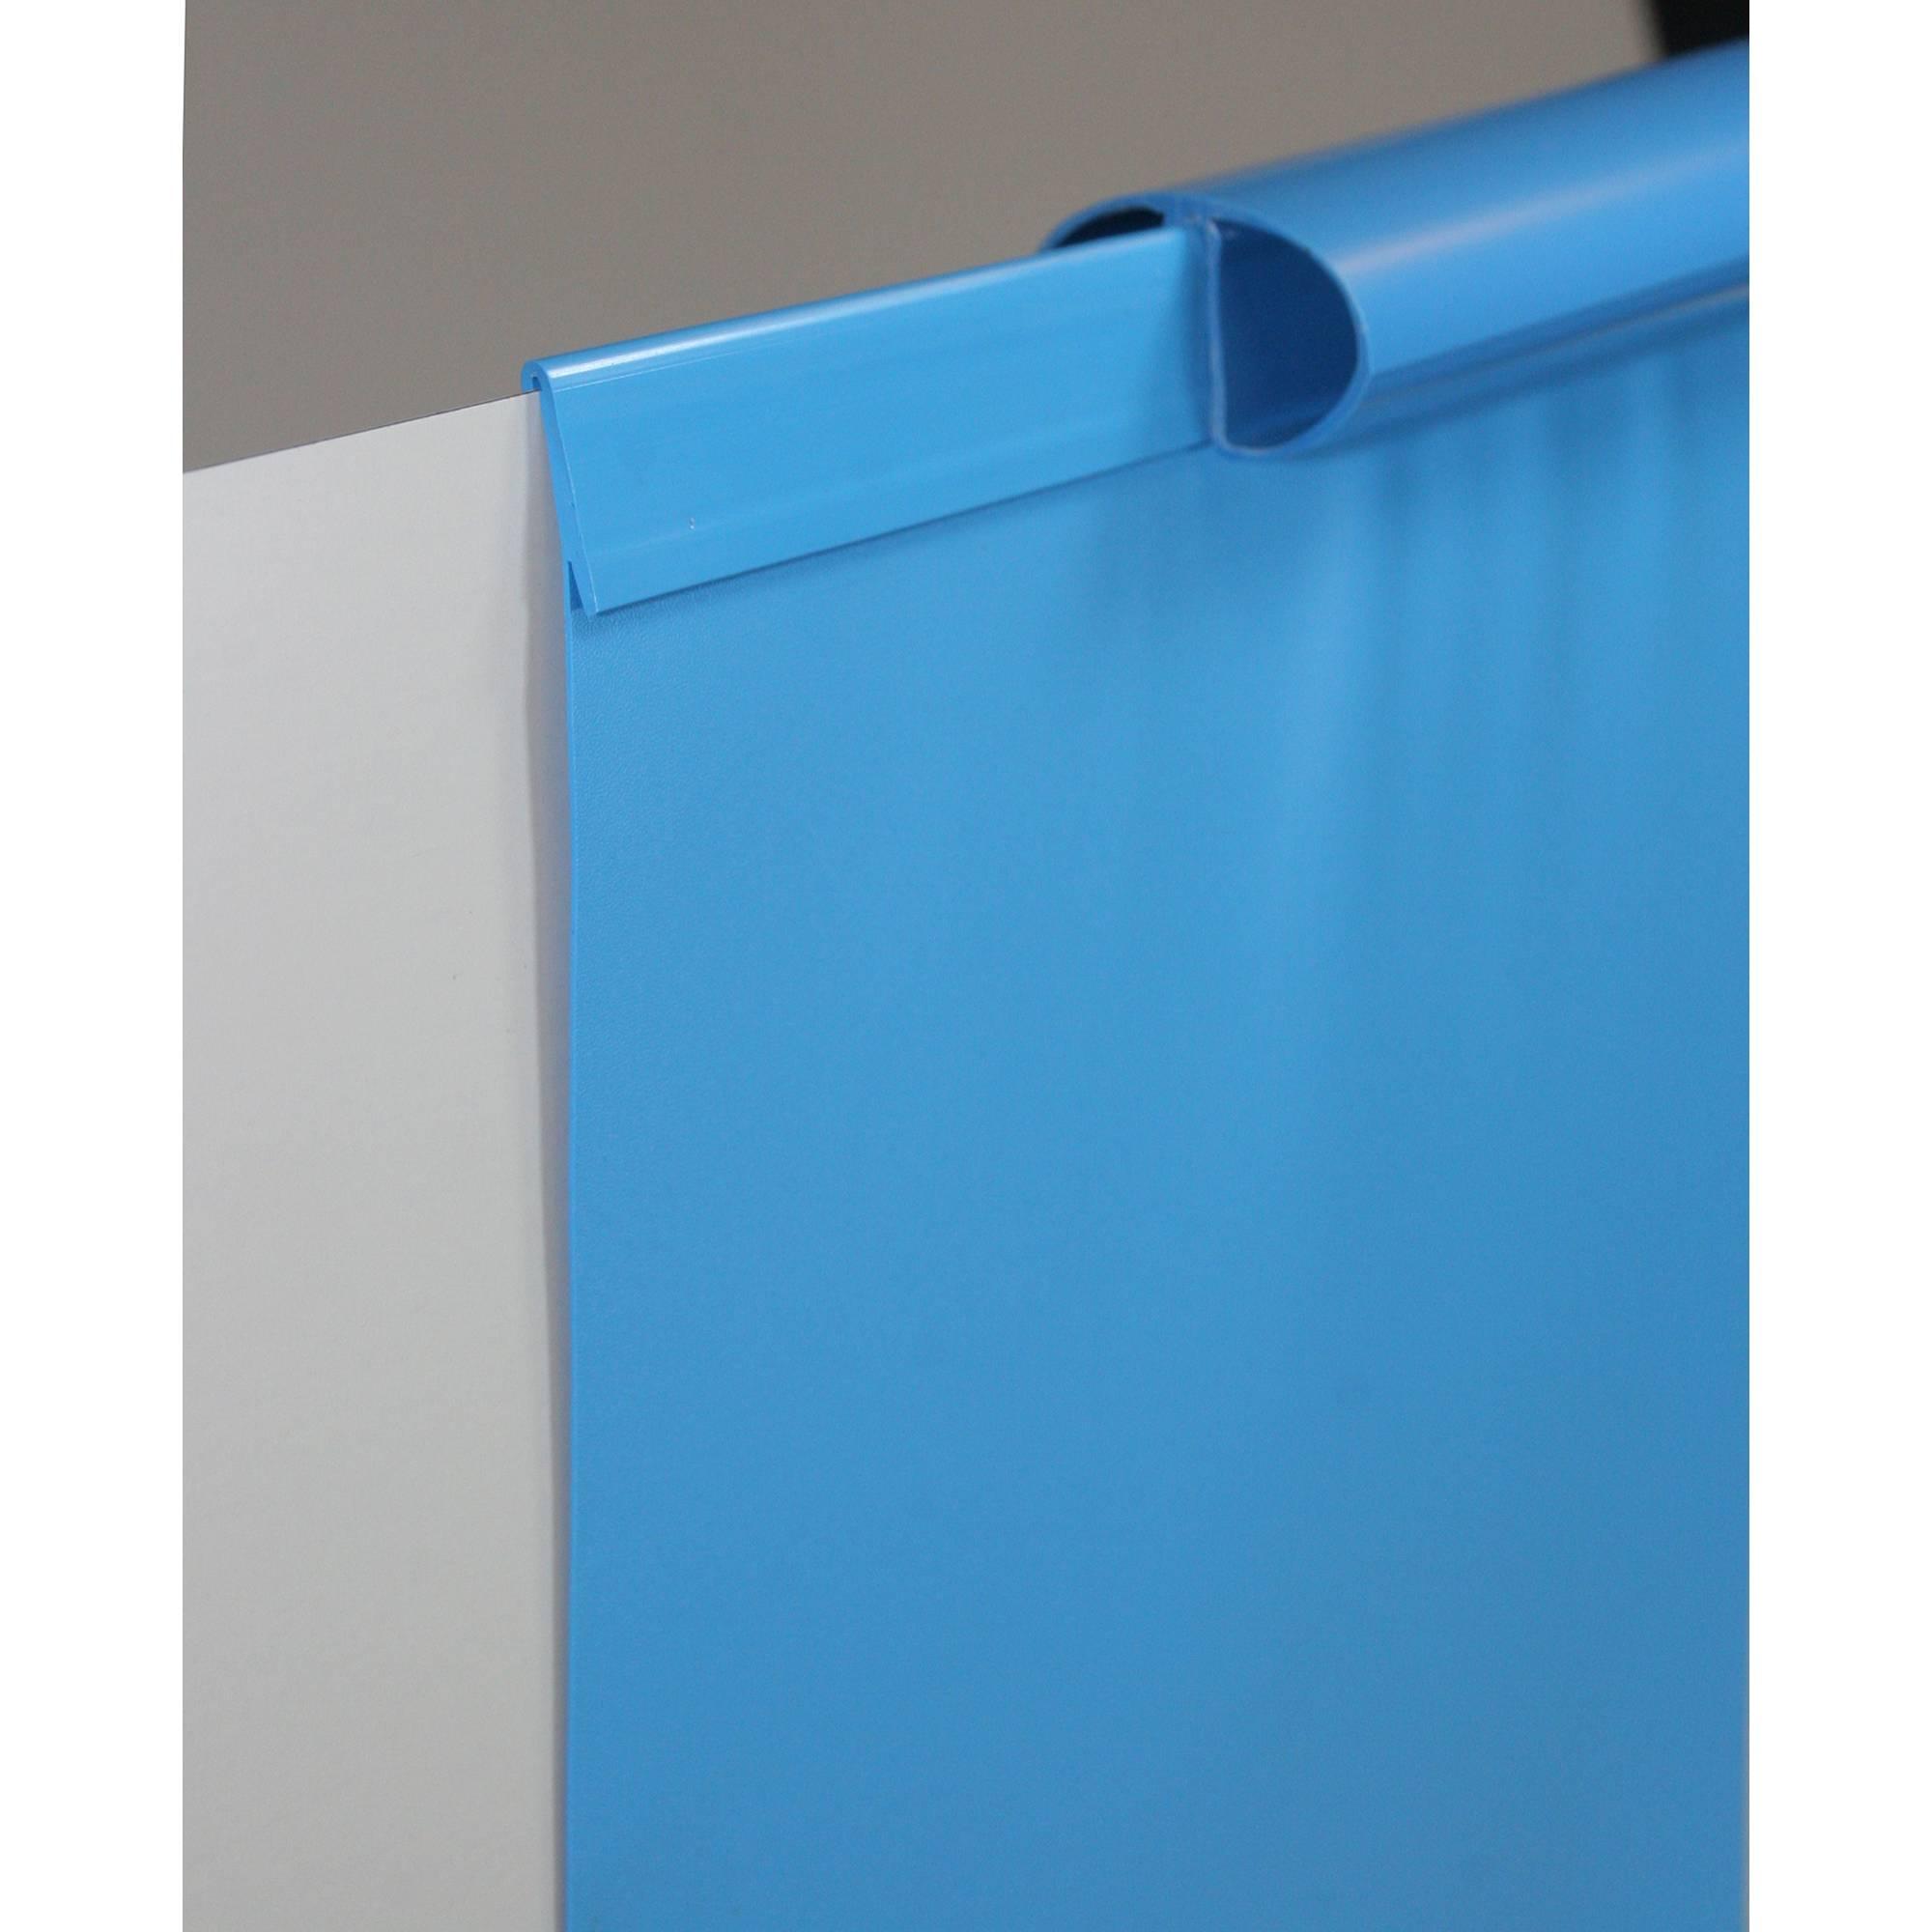 Stahlwandpool rundform  400x120 cm